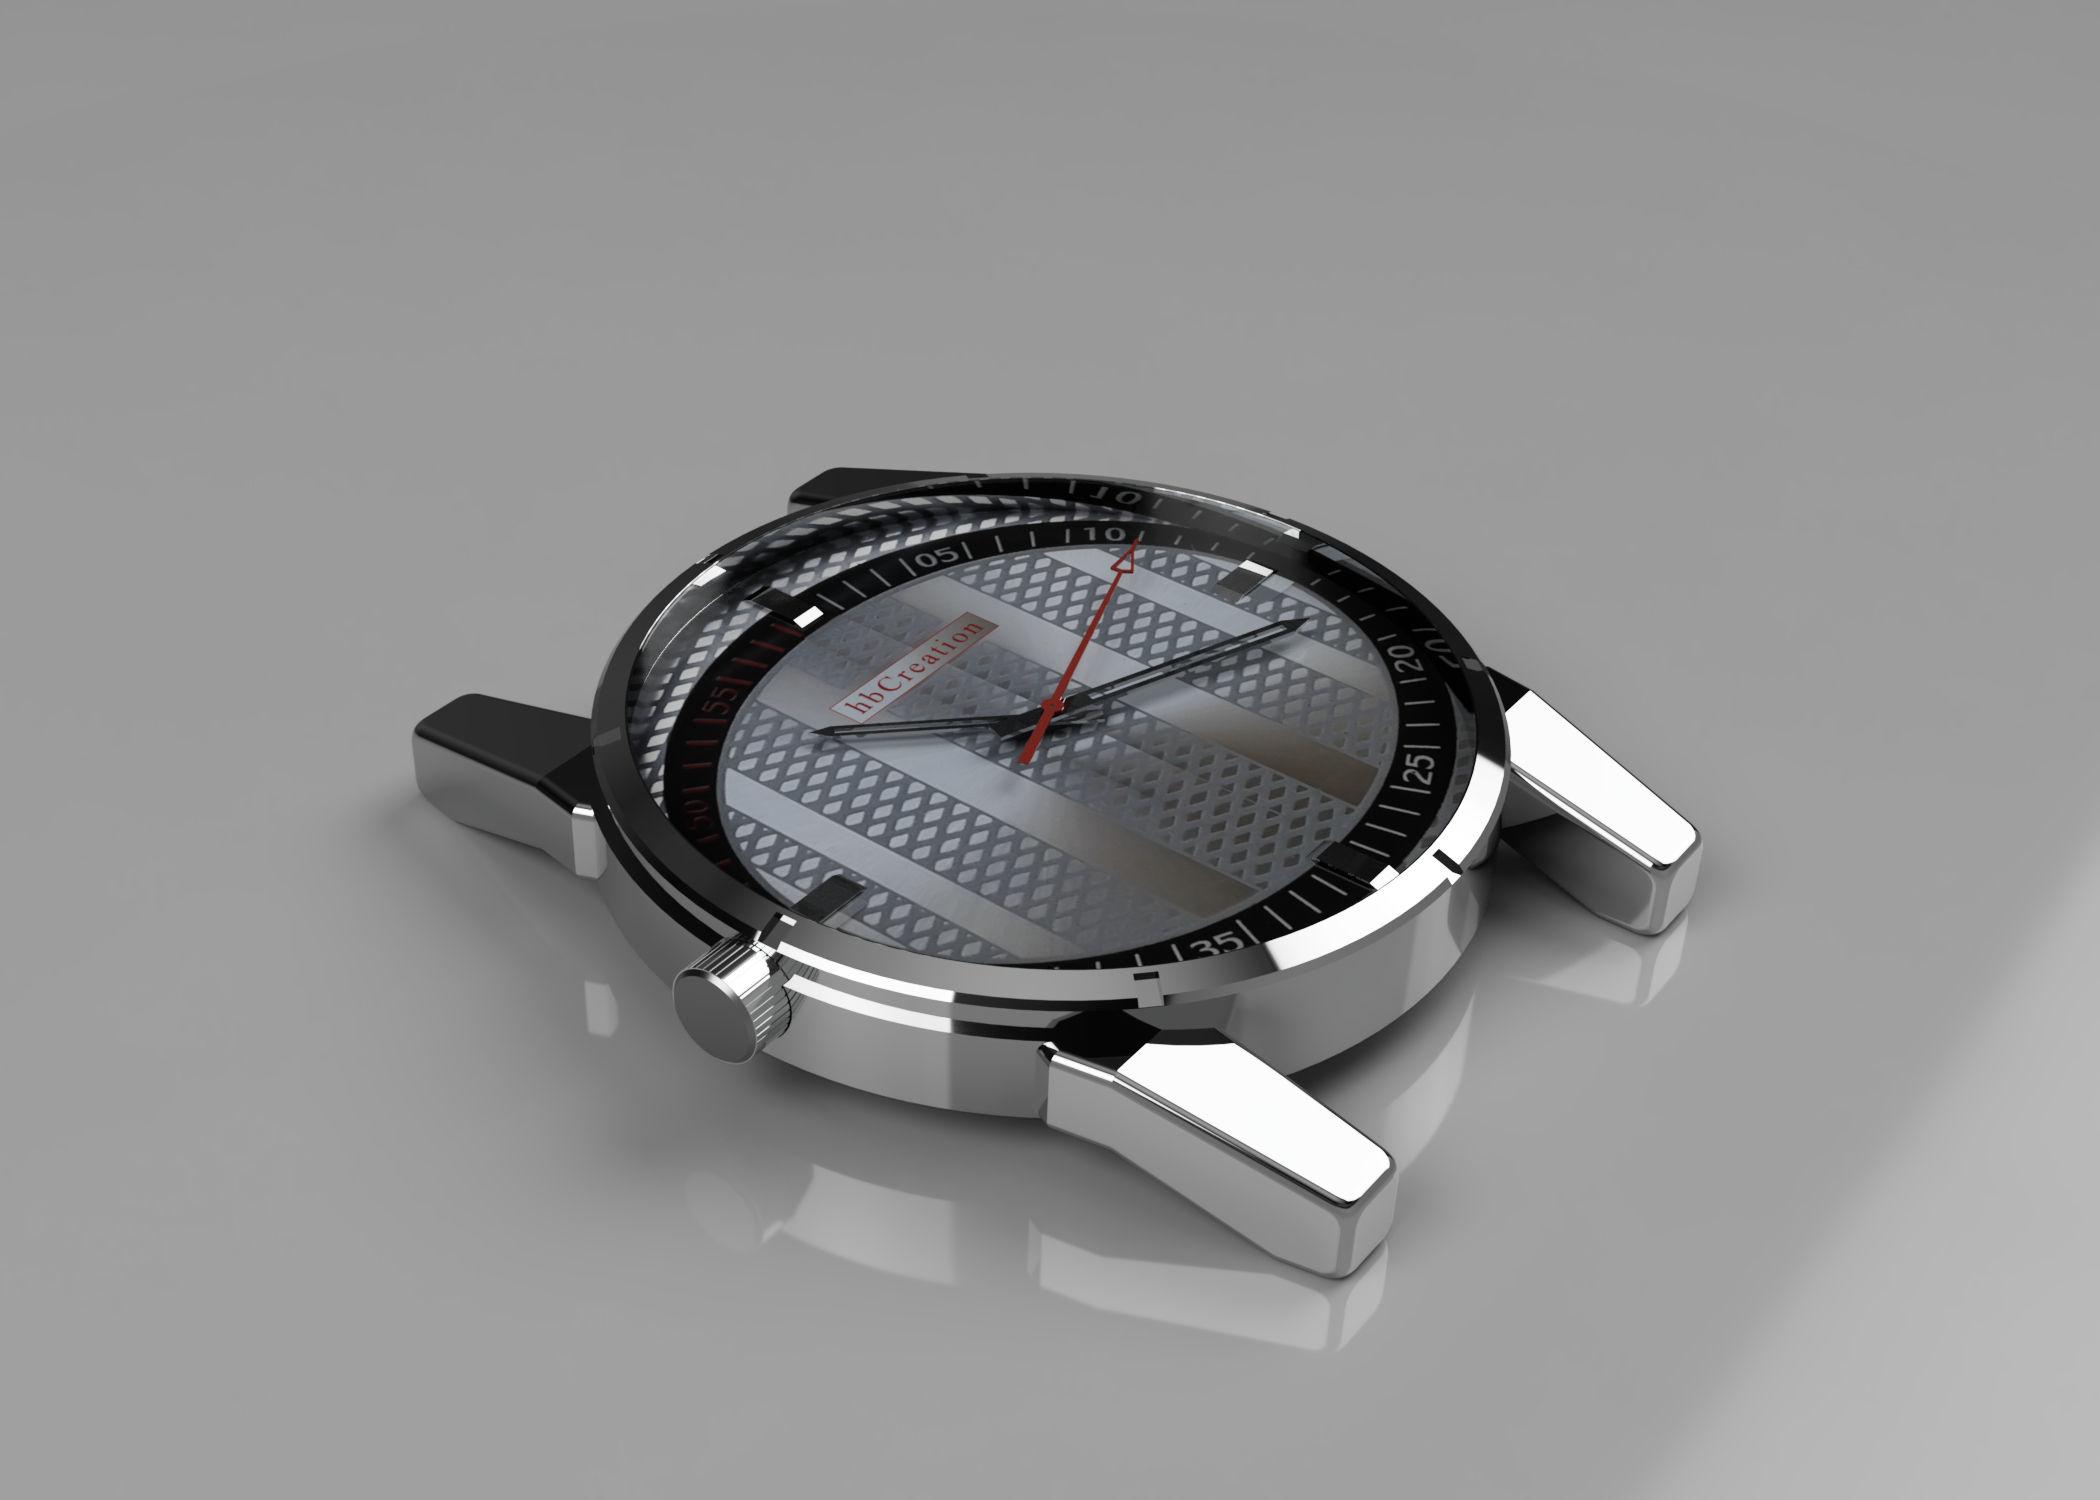 Design-watch-2018-jun-04-06-21-30pm-000-customizedview22366719343-jpg-3500-3500